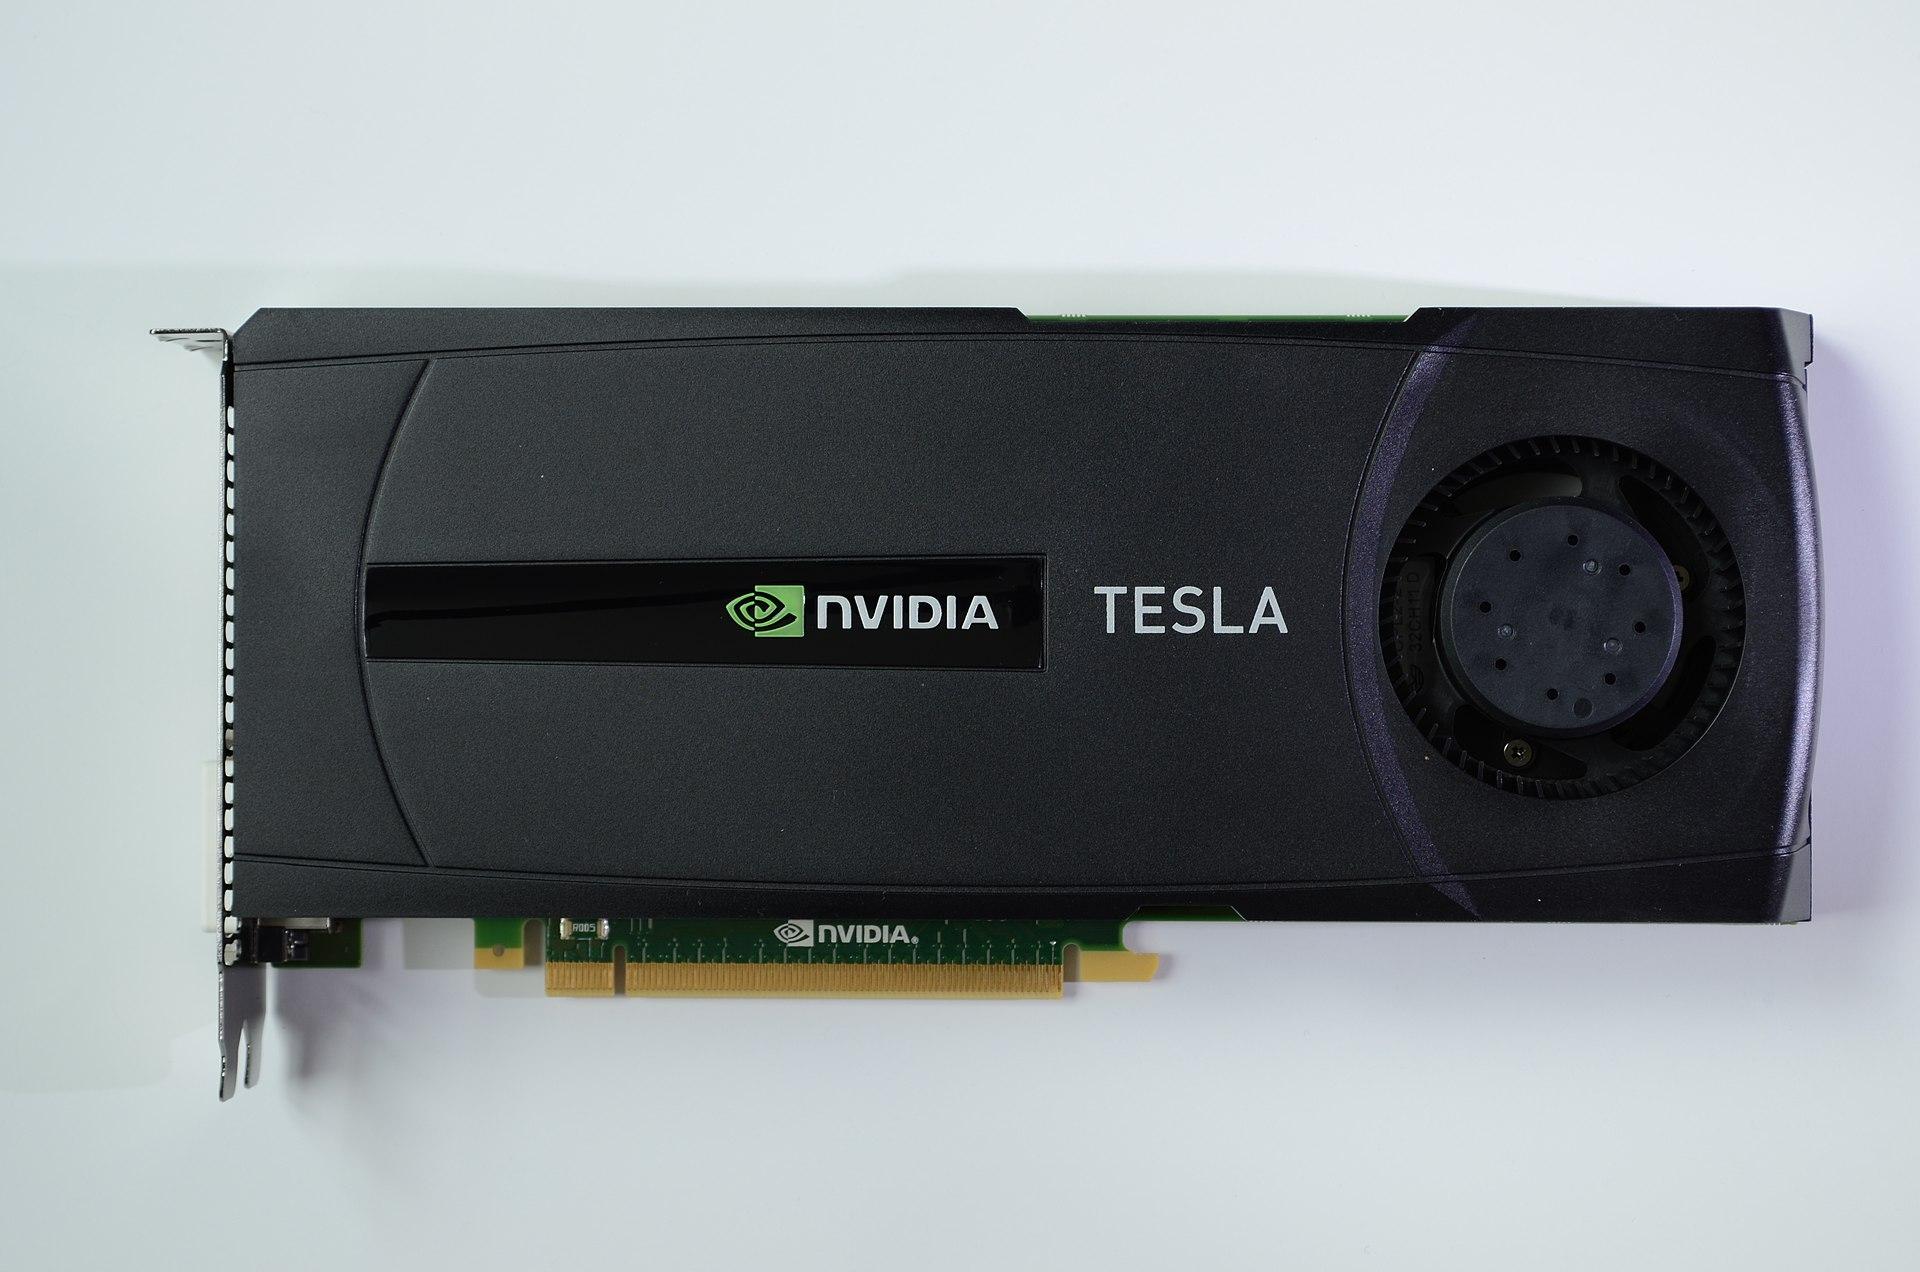 Tesla Update >> Nvidia Tesla - Wikipedia